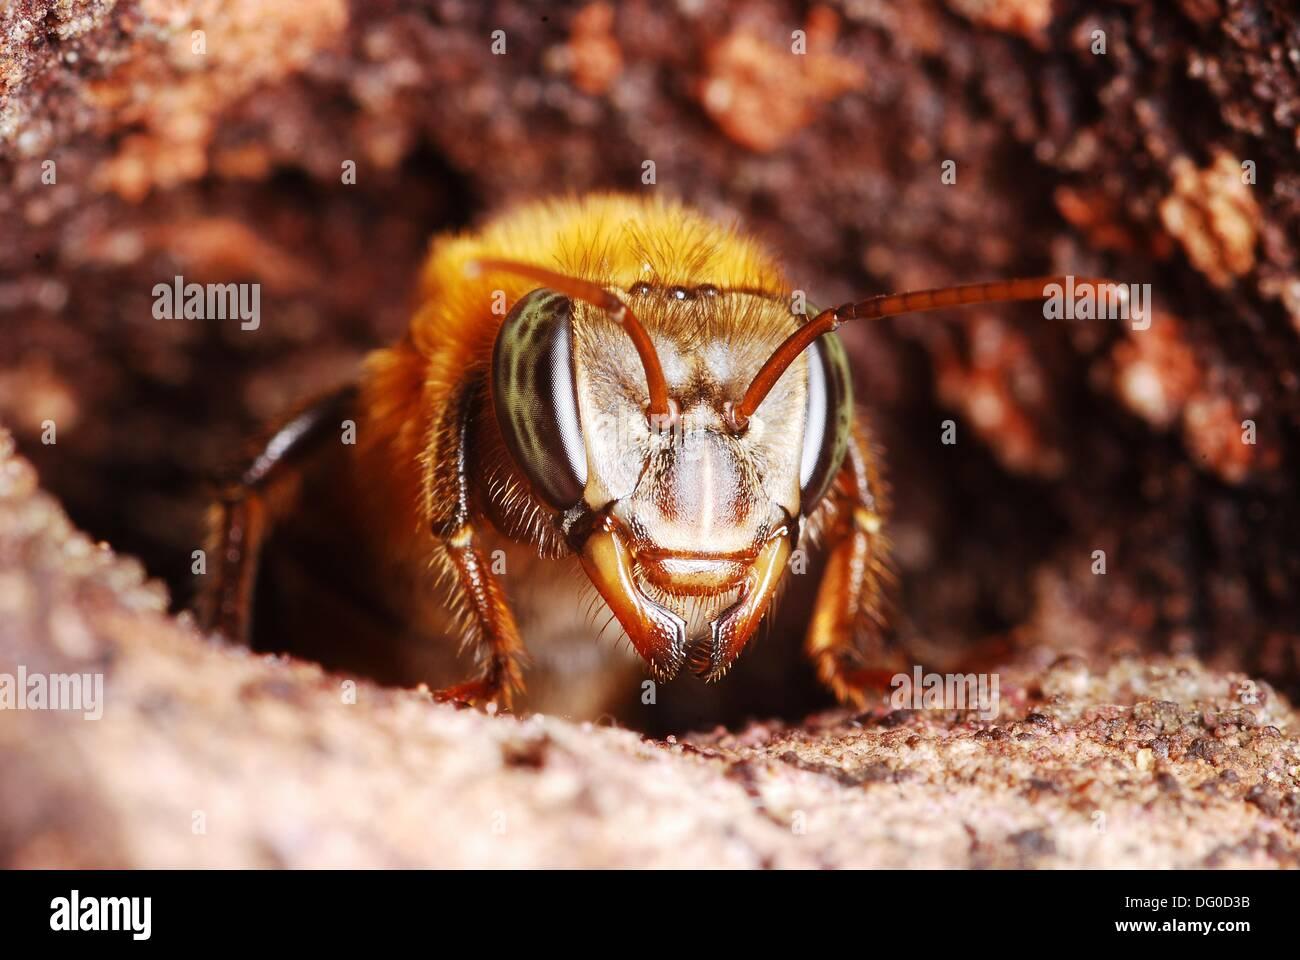 Trabajador de Melipona eburnea nido en la entrada, en Xapuri, Acre, Brasil, 2009 Bee 1cm de largo Imagen De Stock